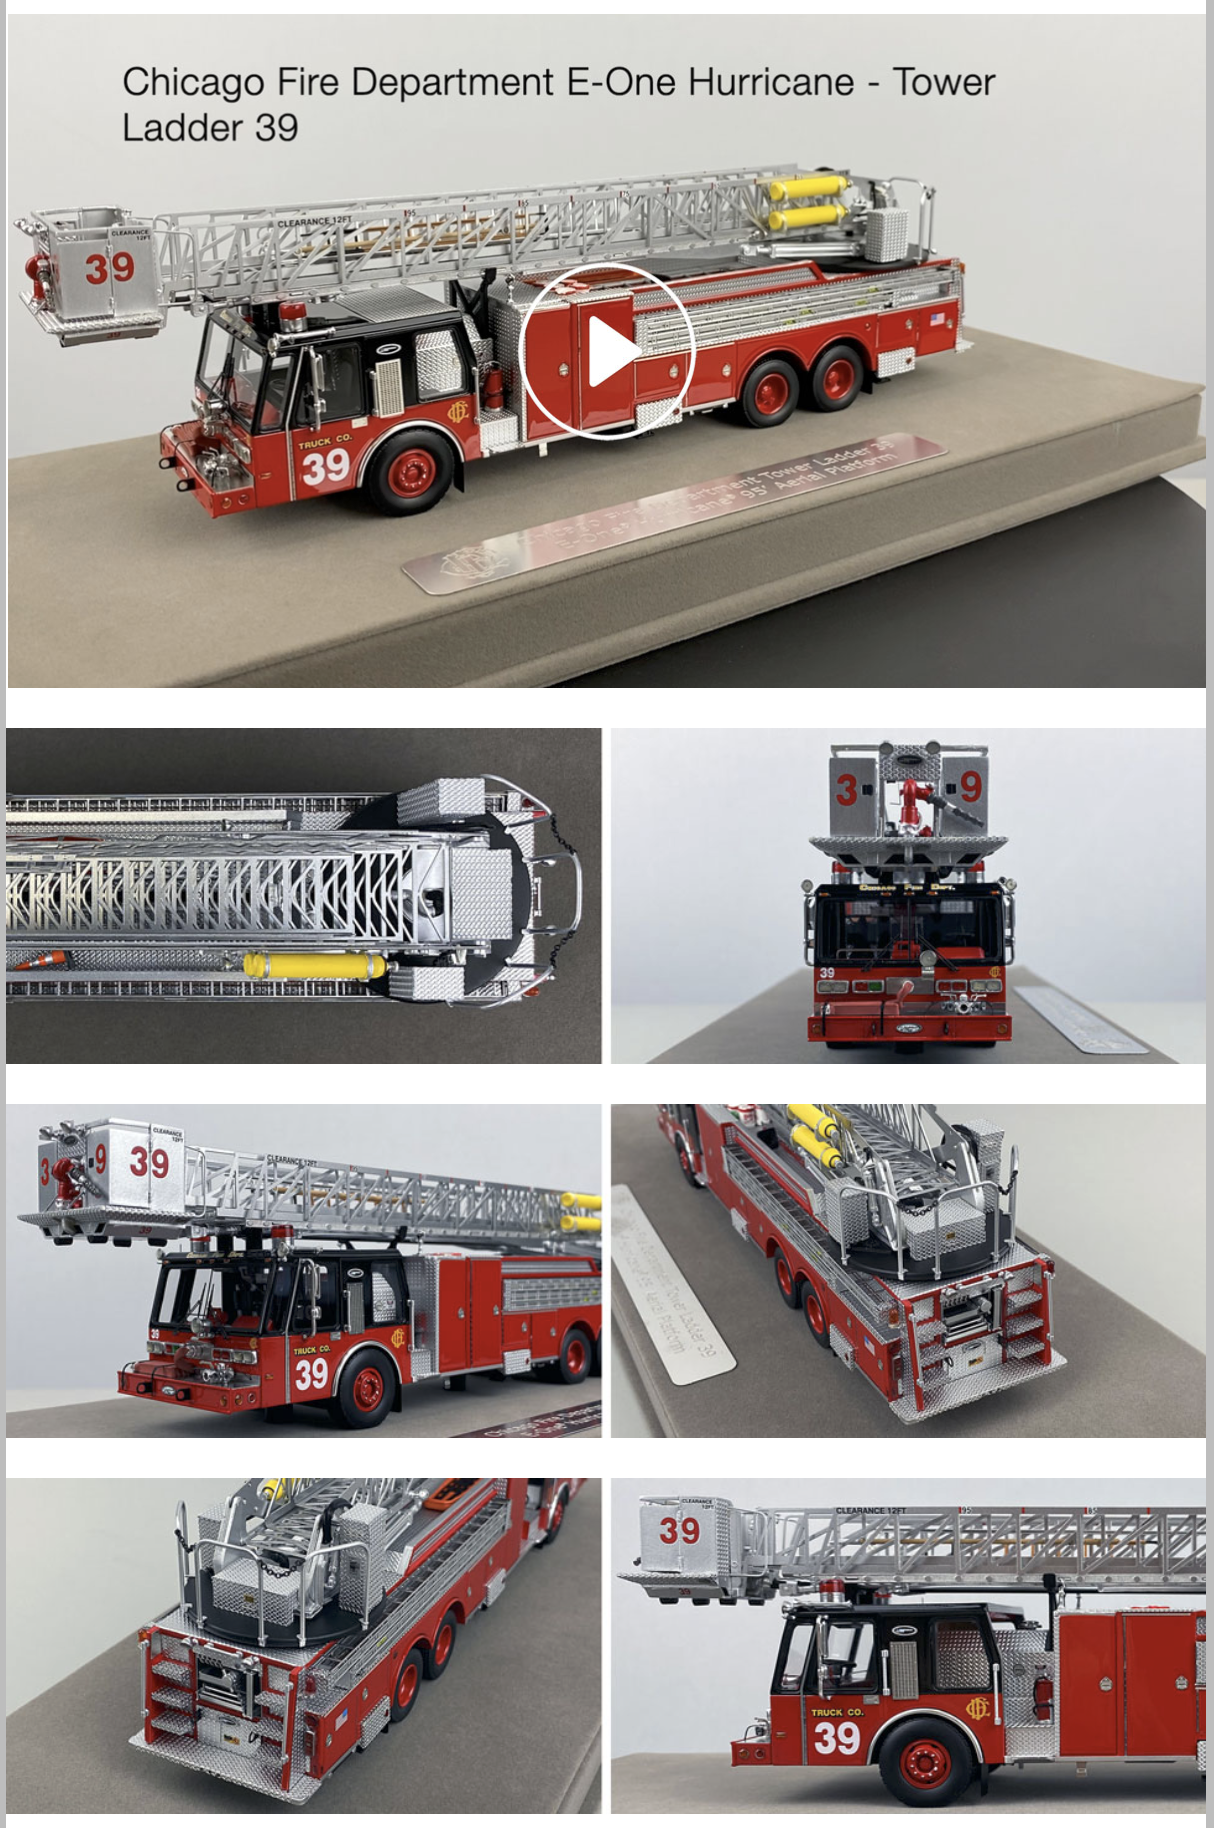 Chicago Fire Department replica models